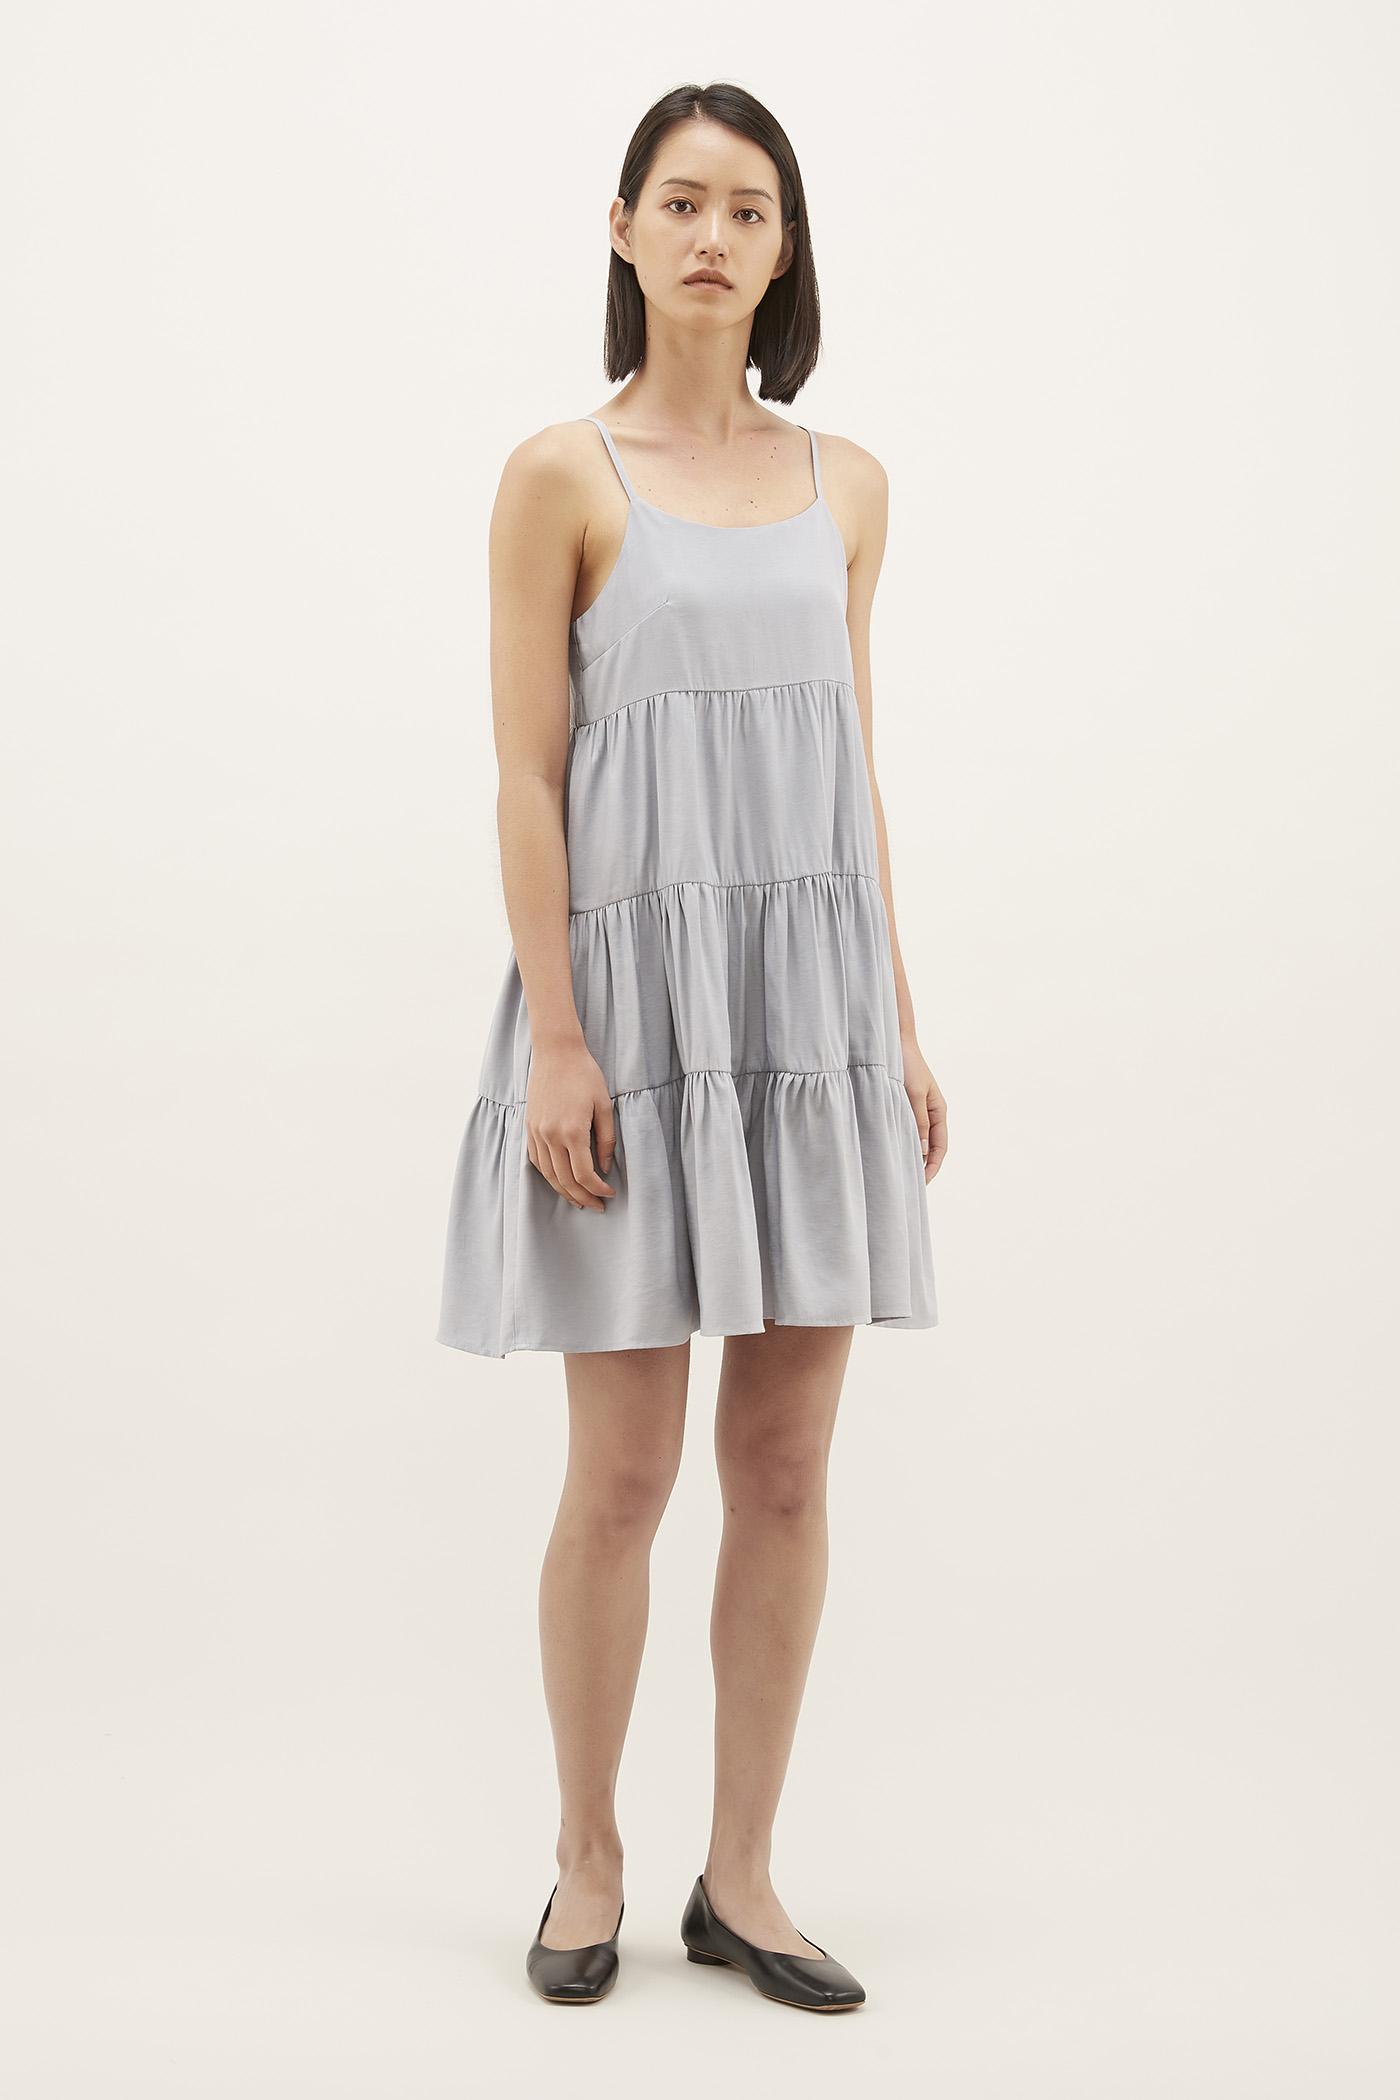 Crista Tiered Dress